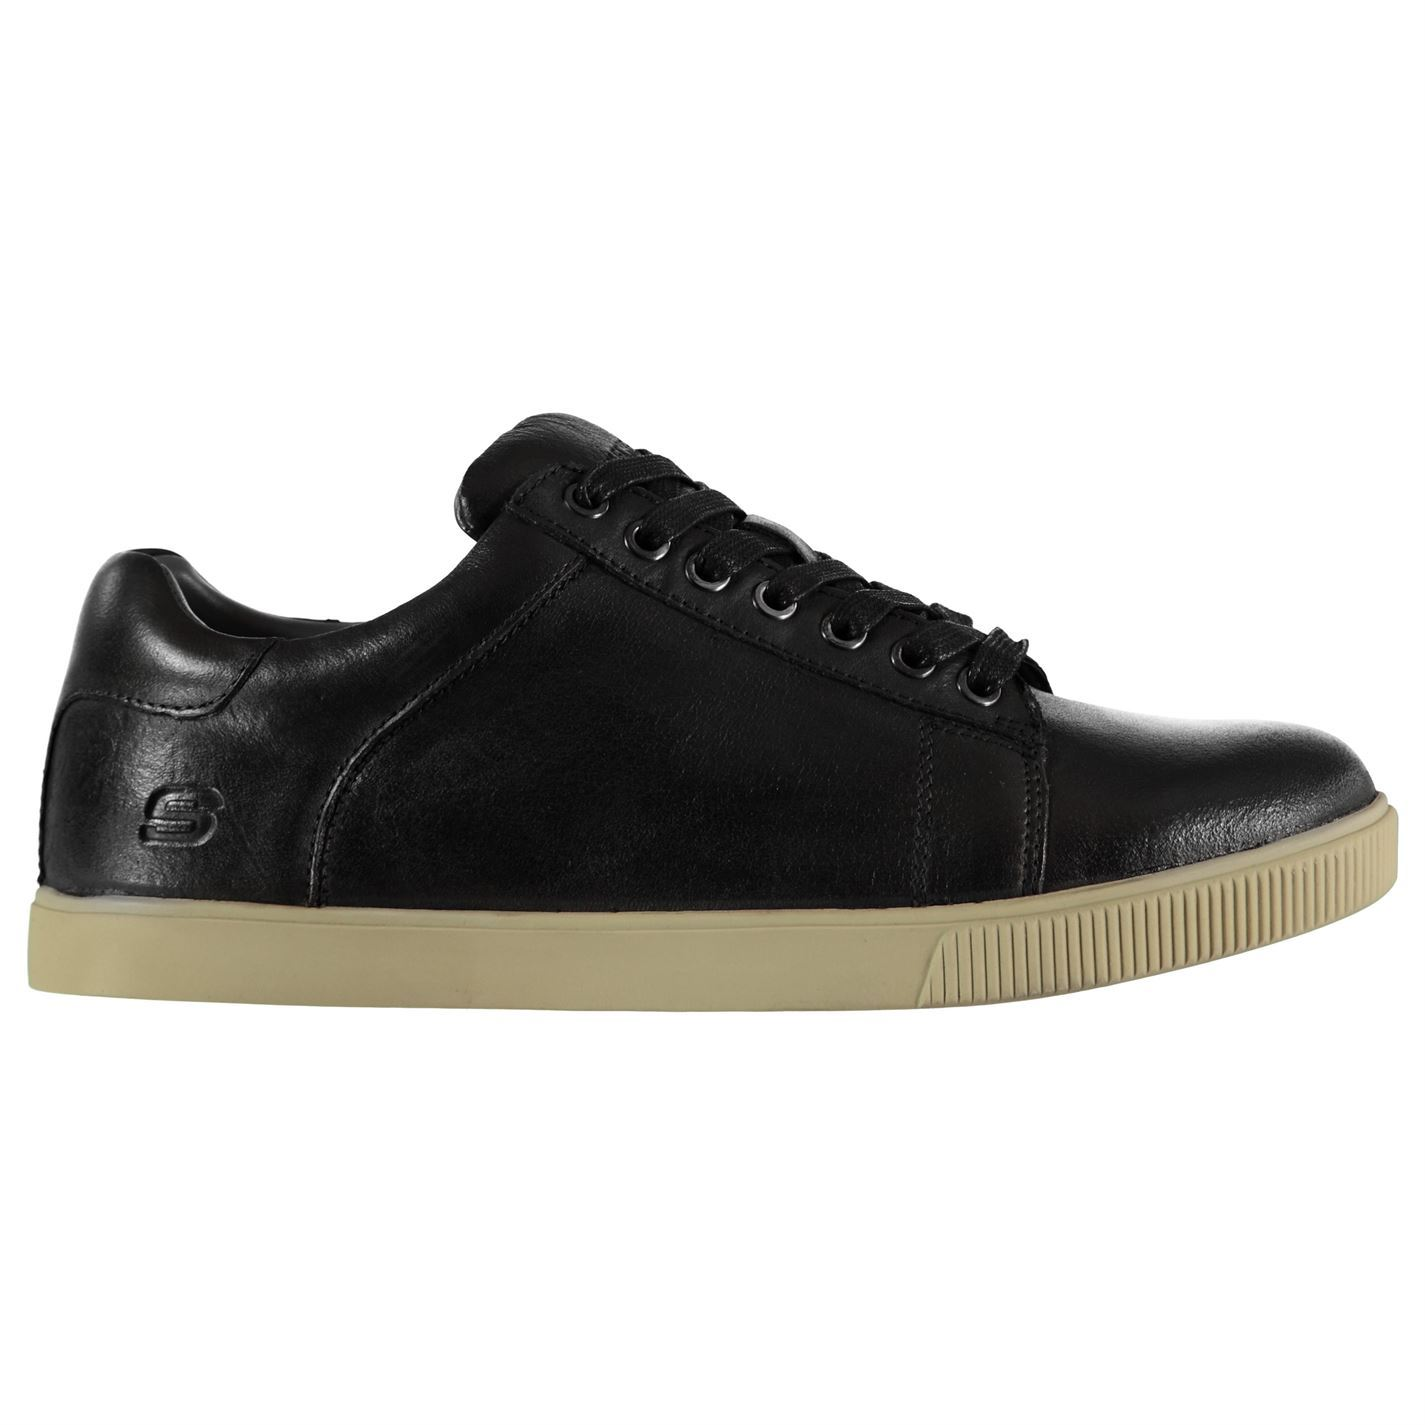 Skechers-Vol-Fandom-Homme-Chaussures-Baskets-decontractees-chaussures-baskets miniature 5